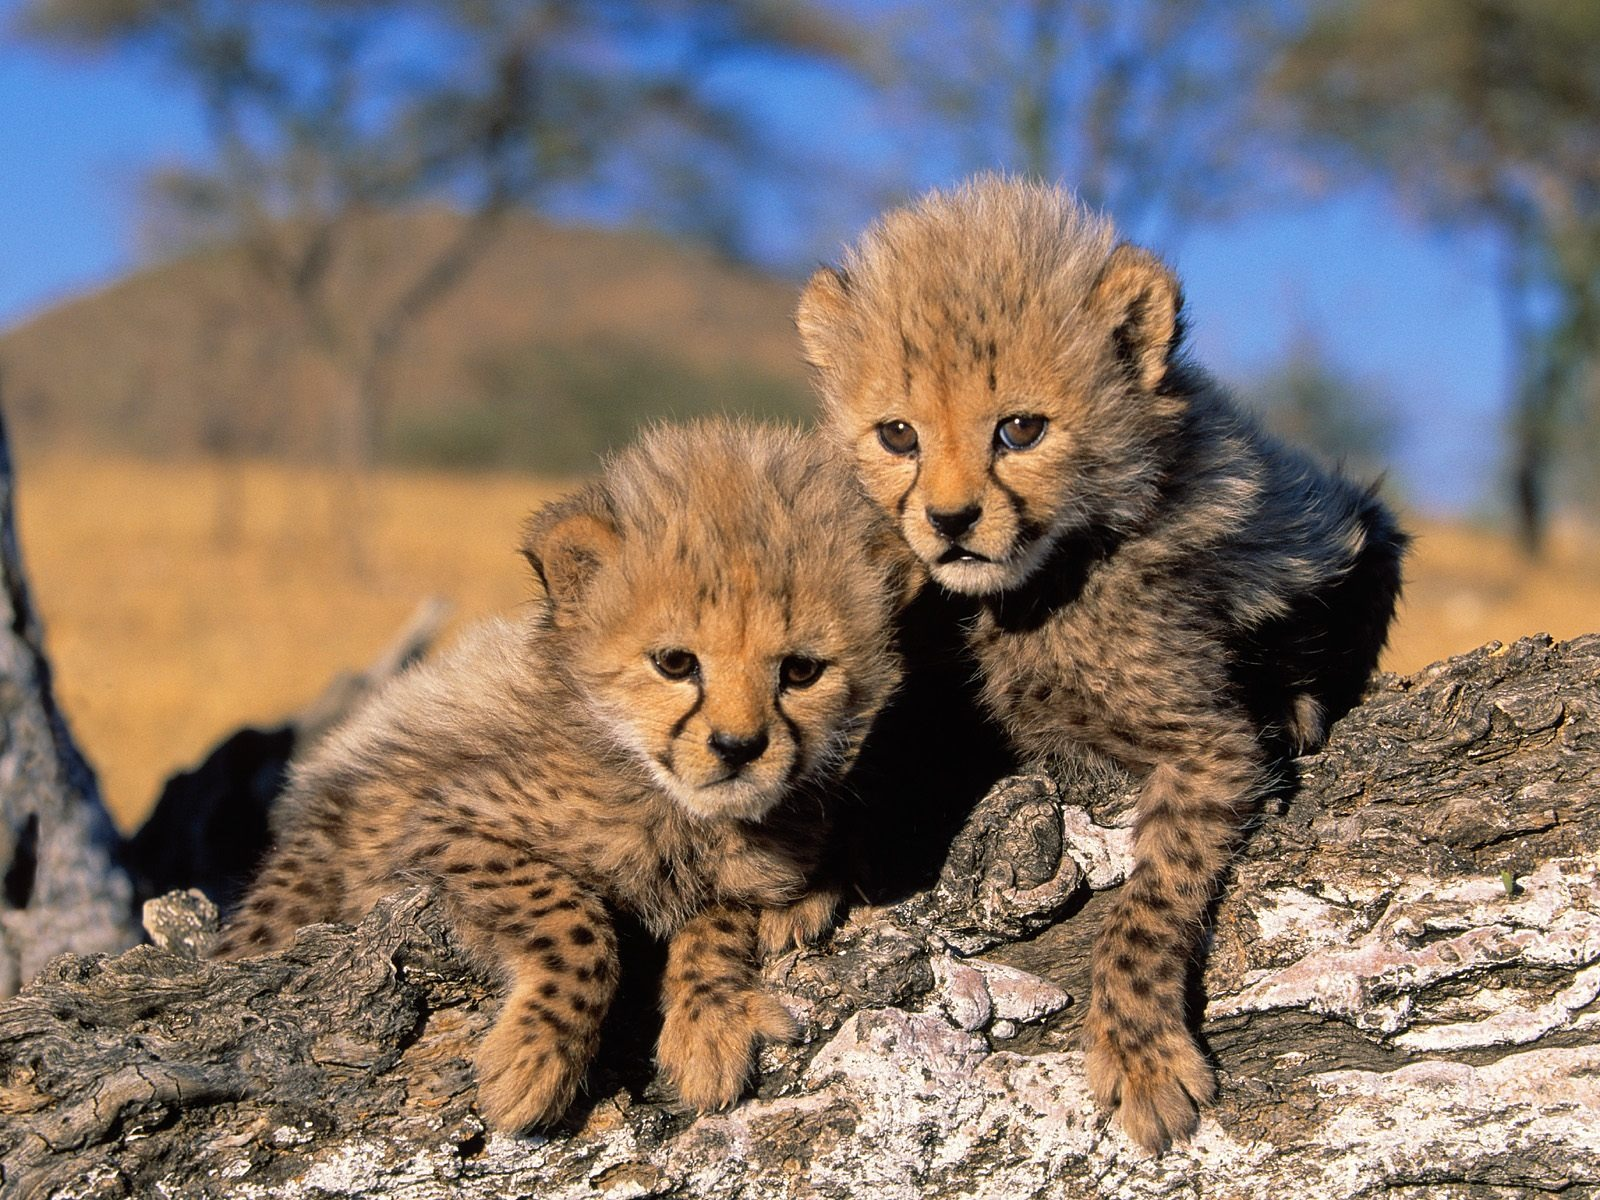 cute baby cheetahs with blue eyes wallpaper baby cheetahs running